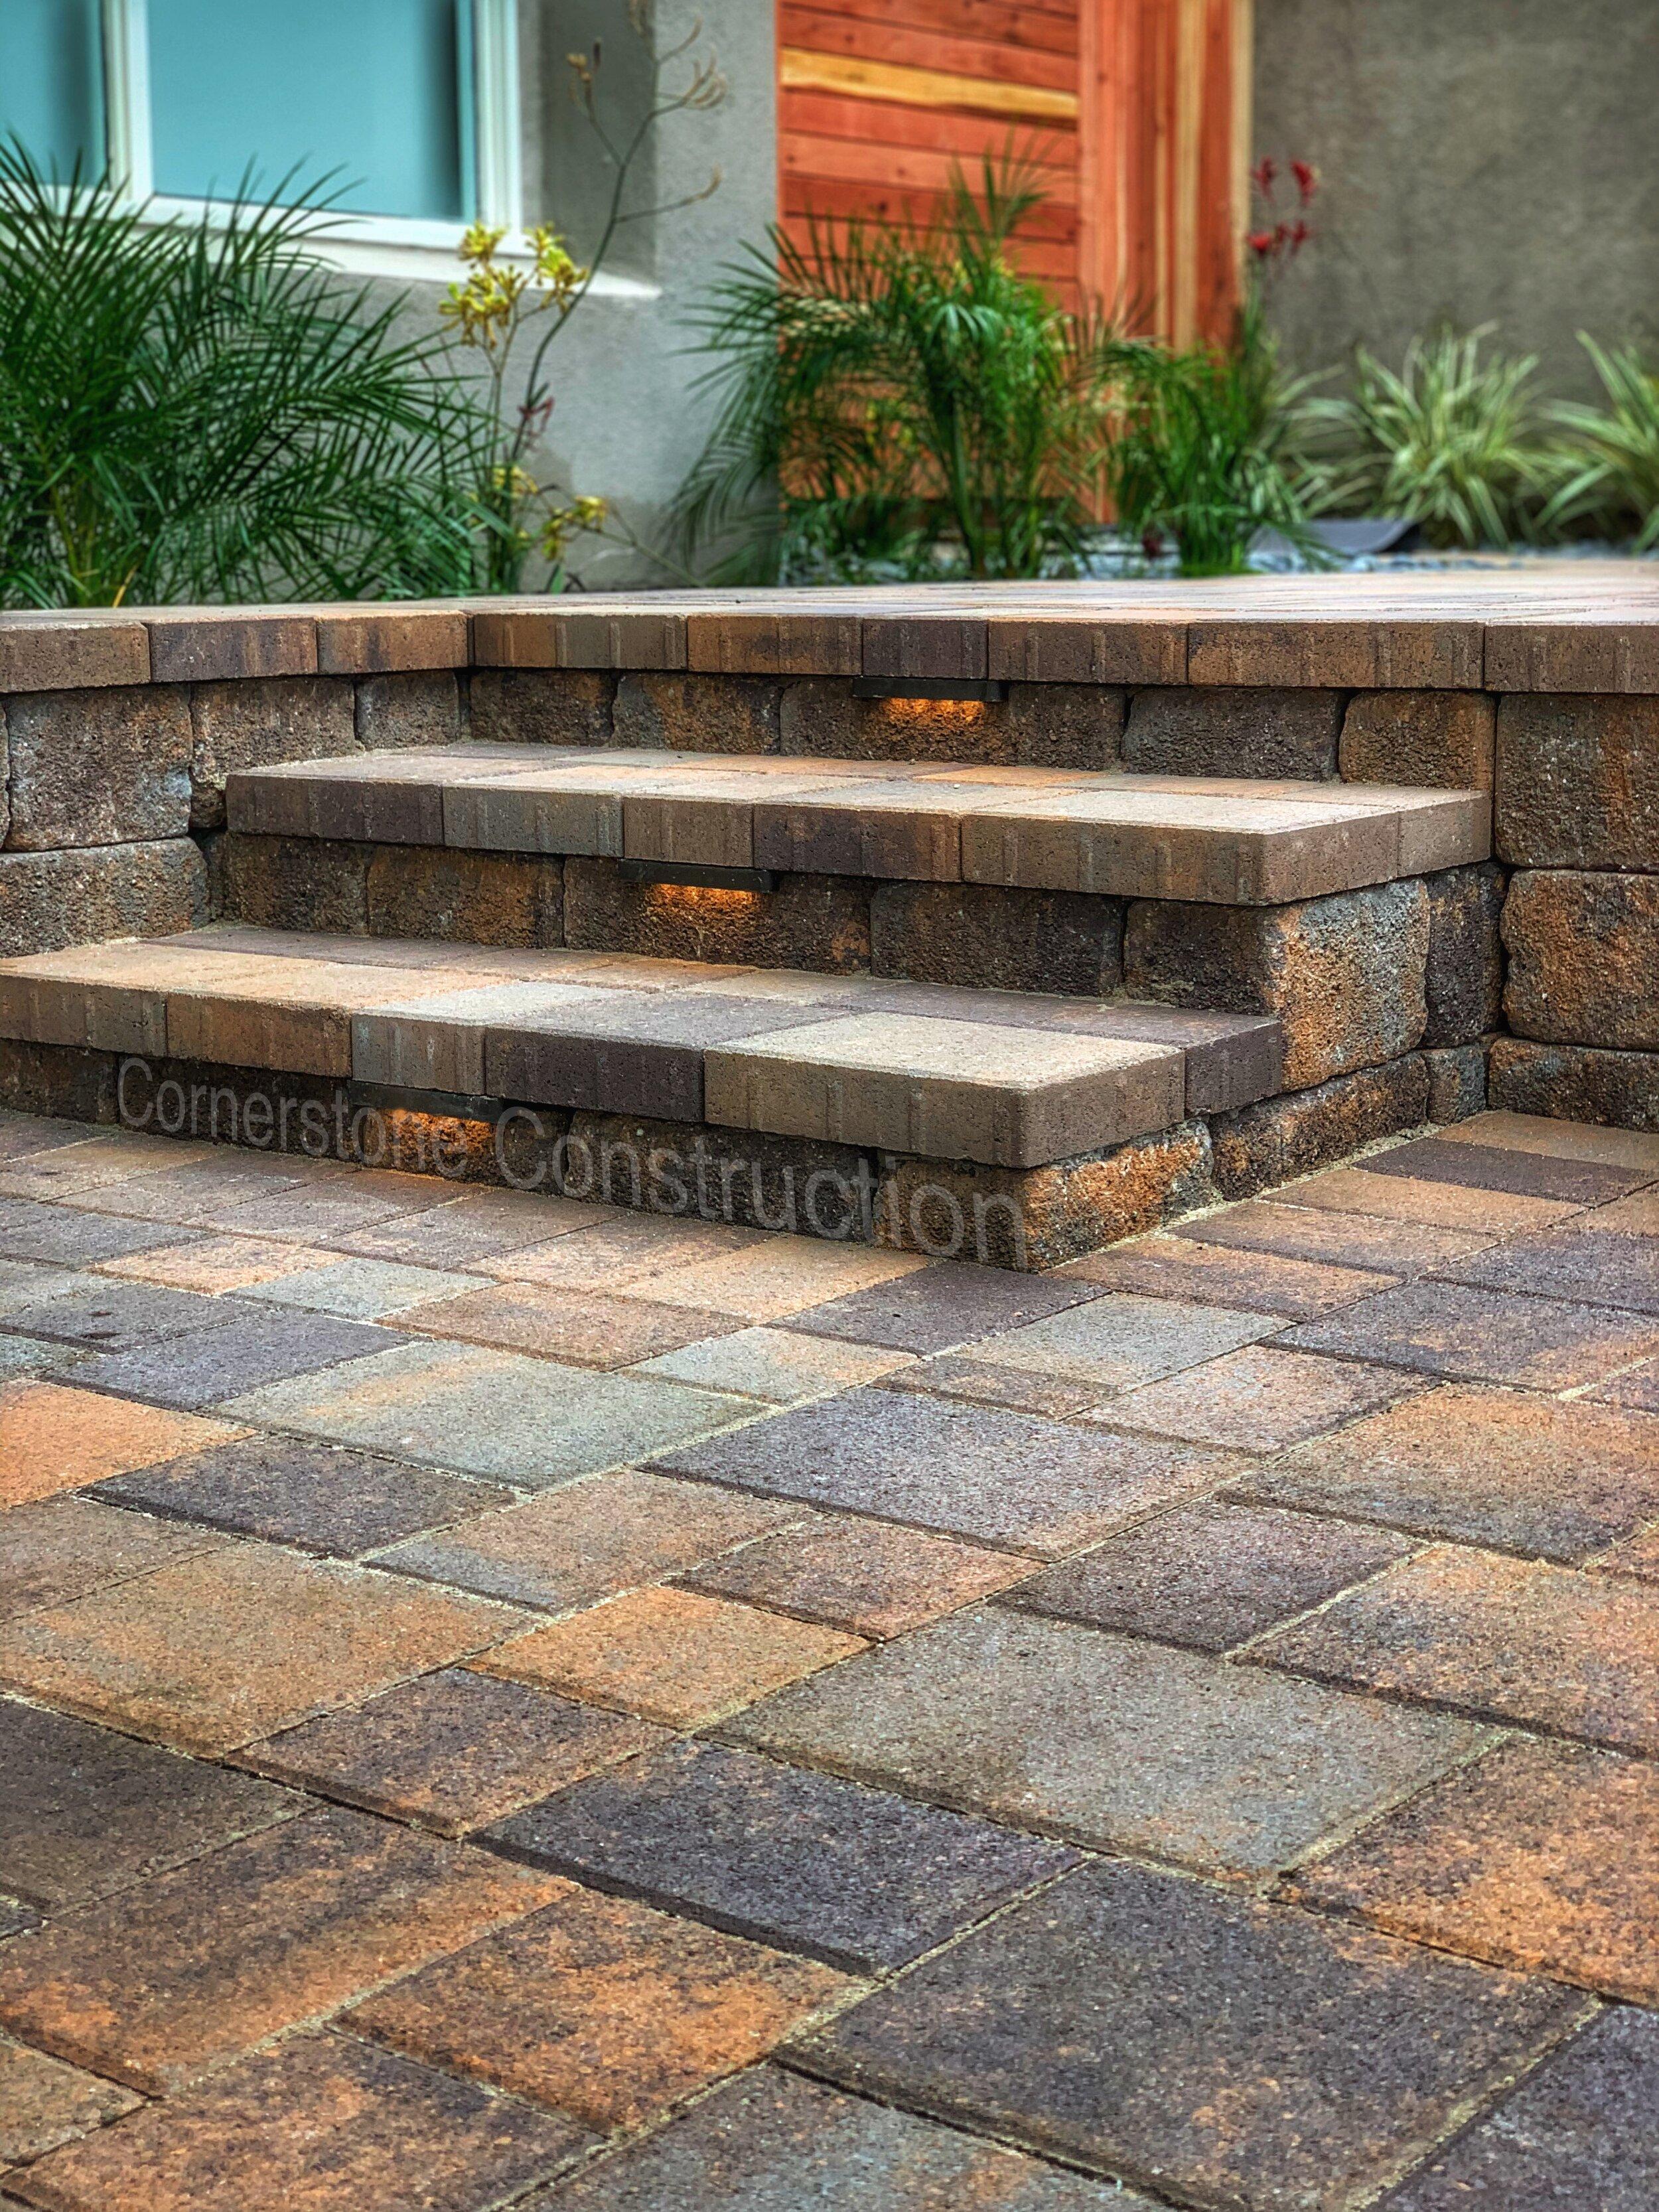 Stone steps in backyard